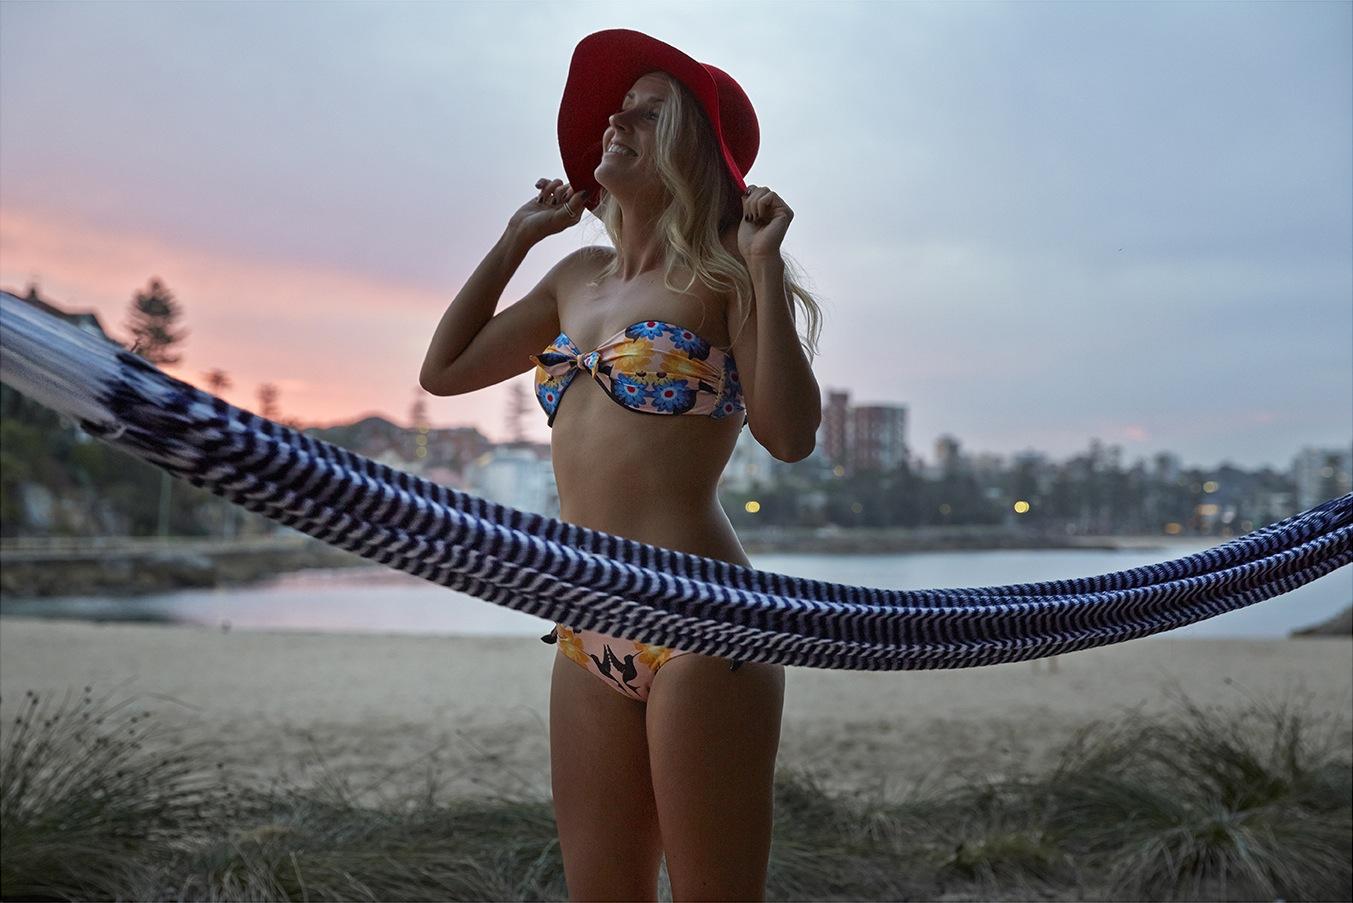 Tropical Aviary Bikini by  Shapes in the Sand Swimwear   Vineyard Haven Hammock by   Yellow Leaf Hammocks